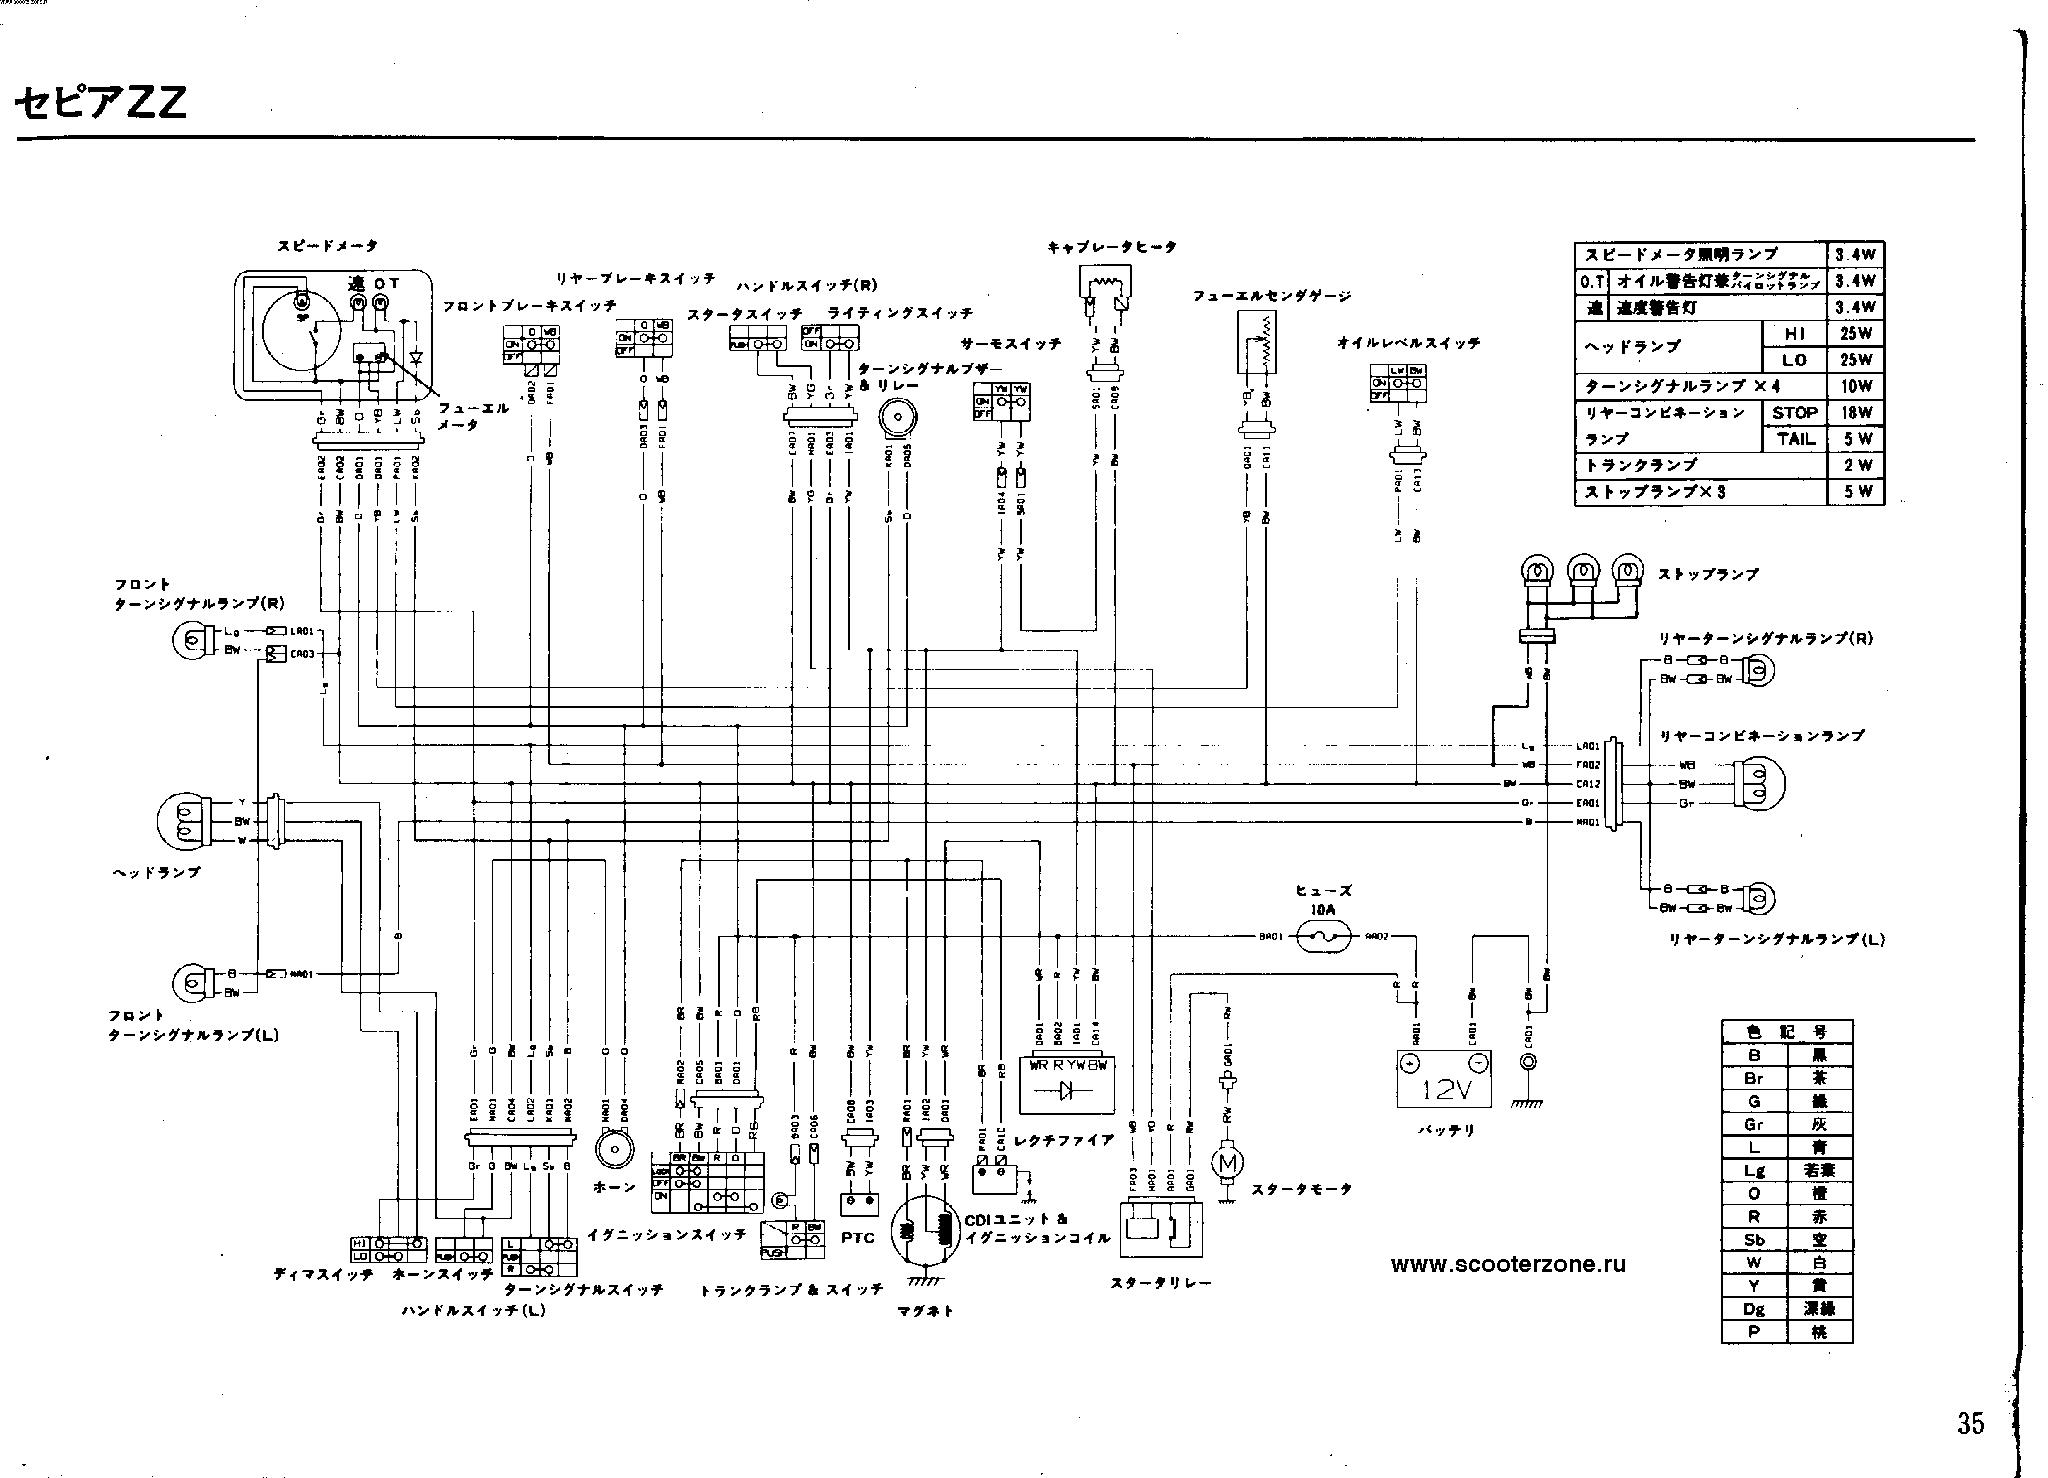 схема электро оборудования на скутер Suzuki Street Magic.